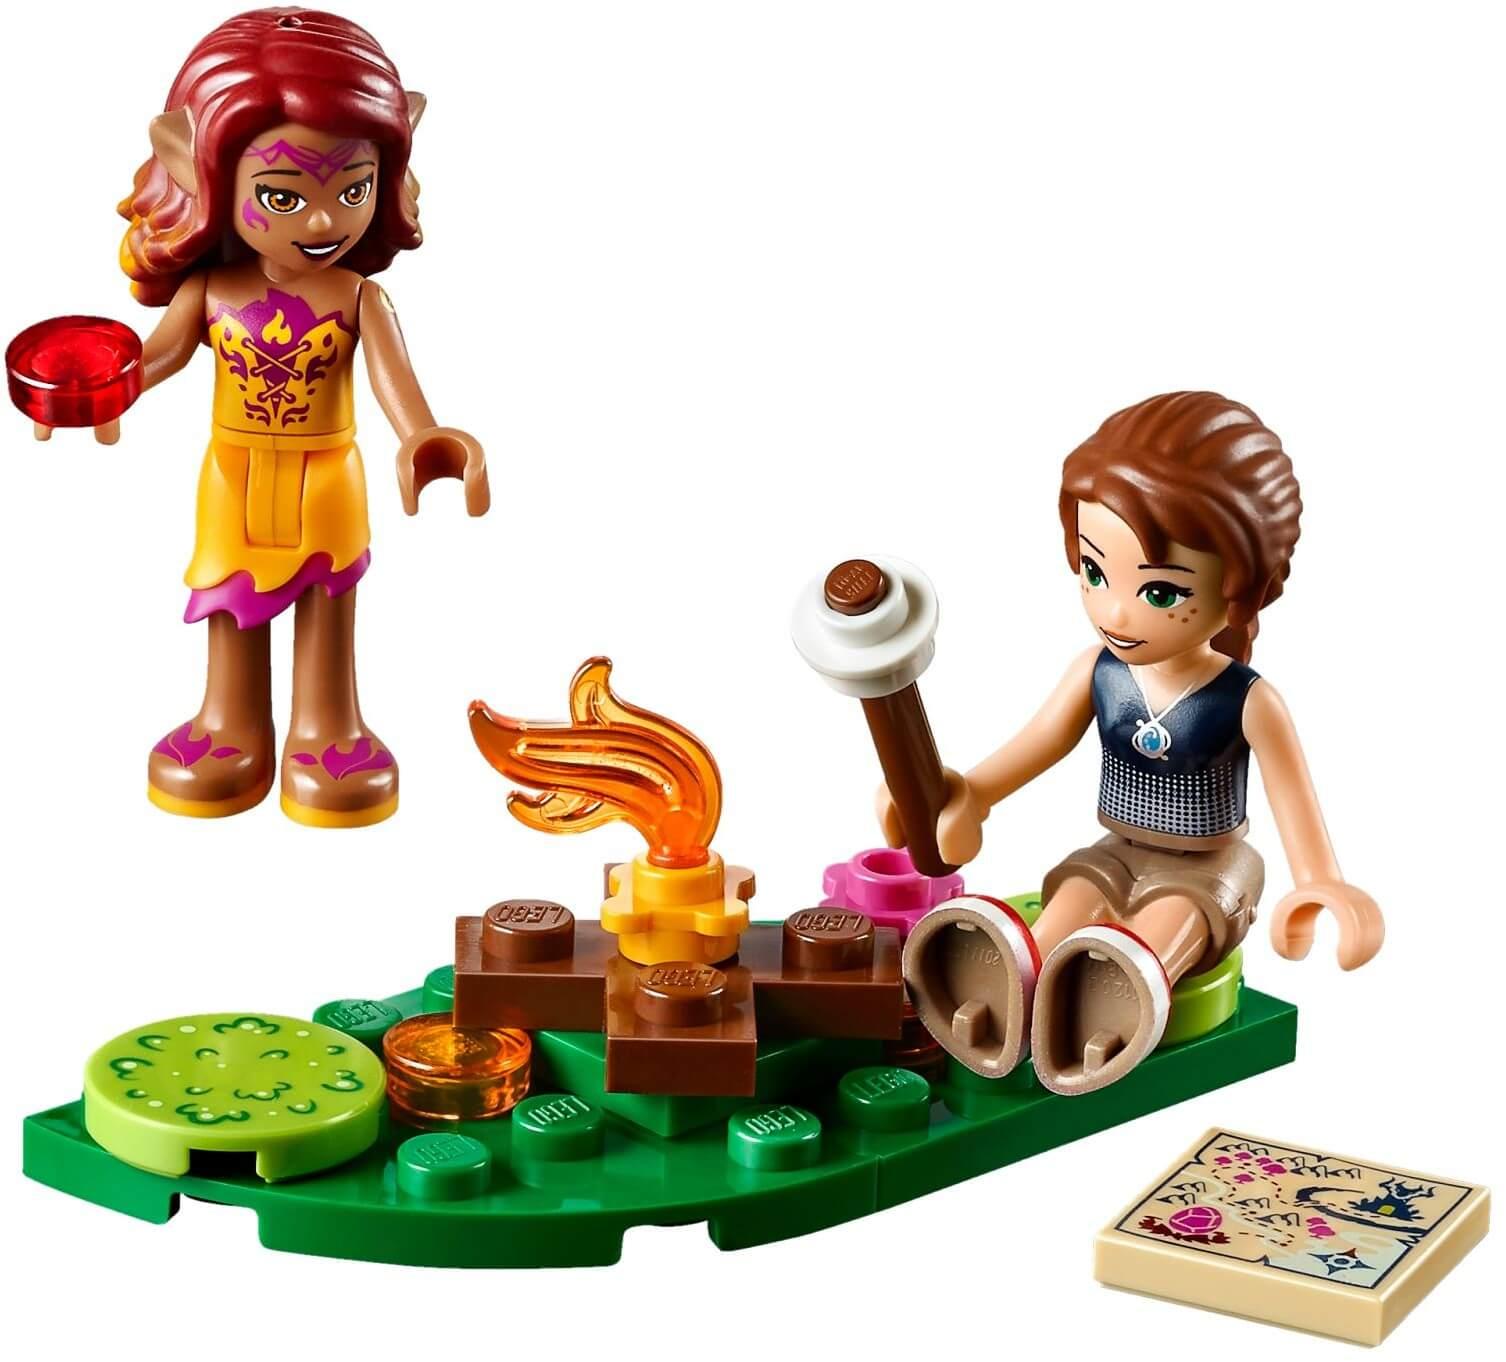 Mua đồ chơi LEGO 41175 - LEGO Elves 41175 - Hang Núi Bí Mật Của Rồng Lửa (LEGO Elves Fire Dragon's Lava Cave 41175)